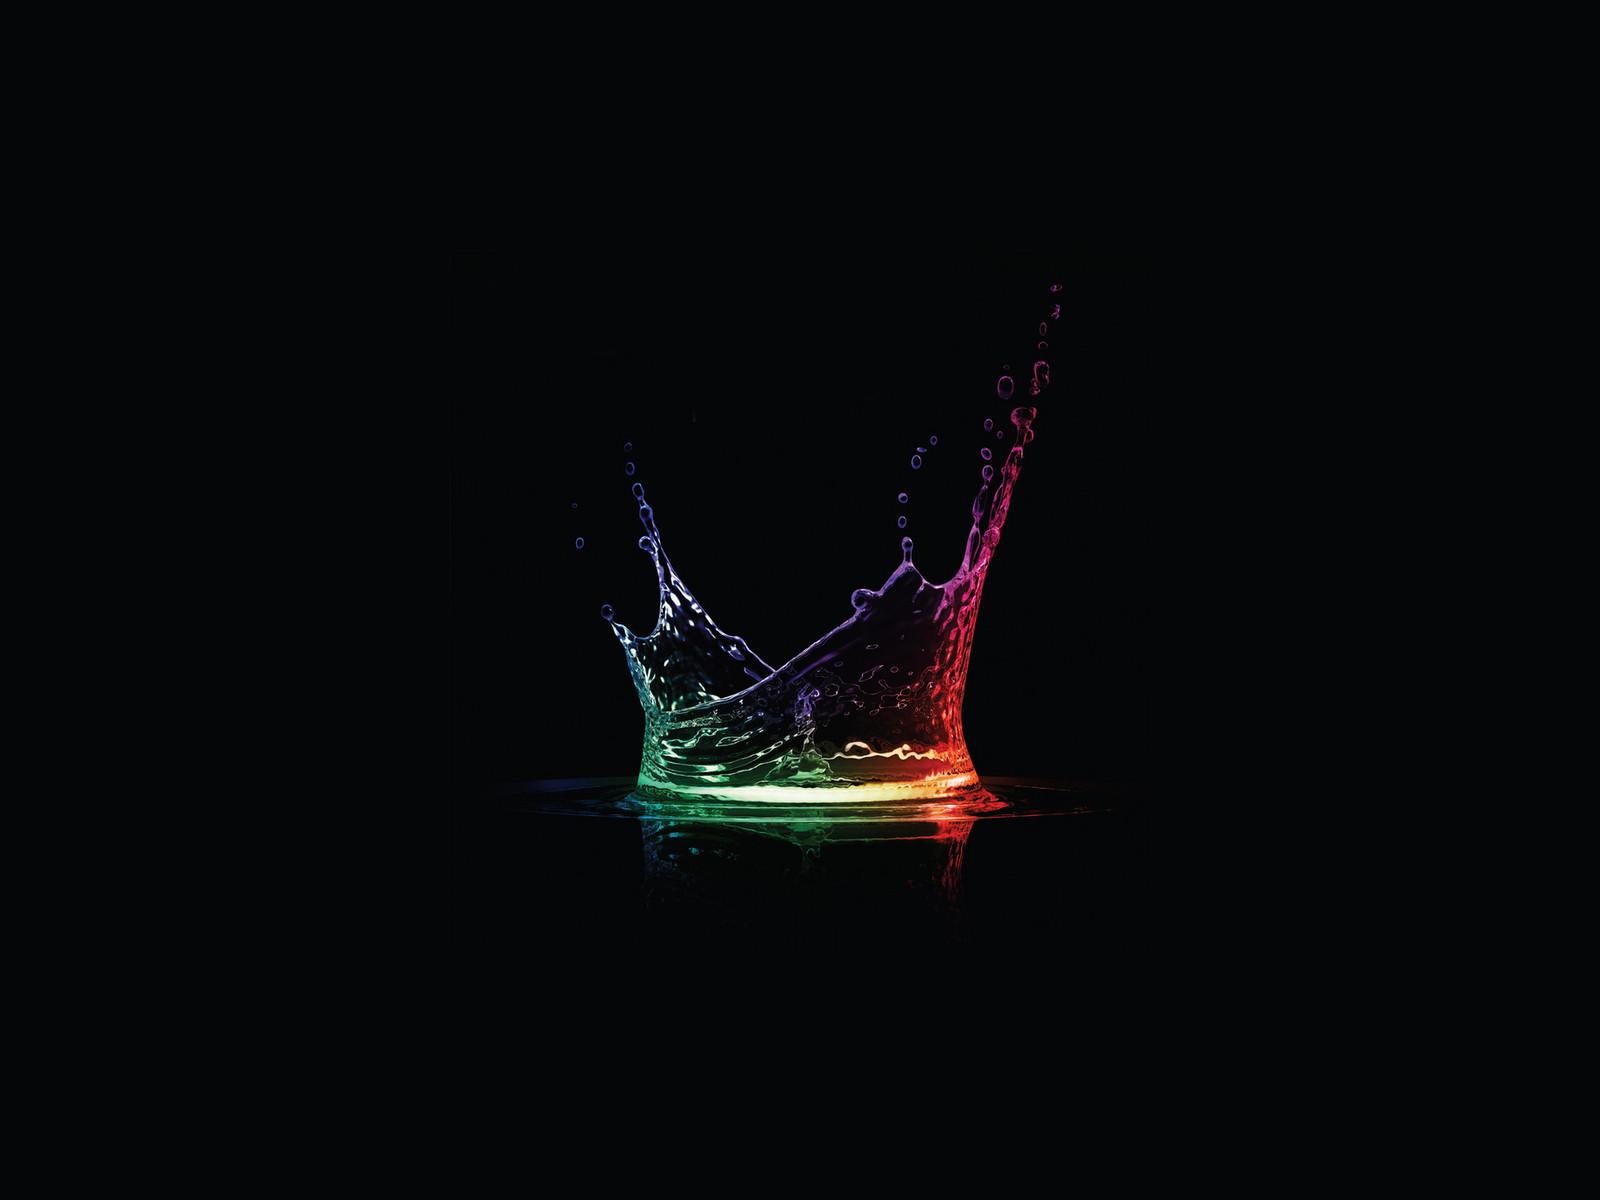 58_1600x1200_rainbow_splash.png 1,600×1,200 pixels Crown